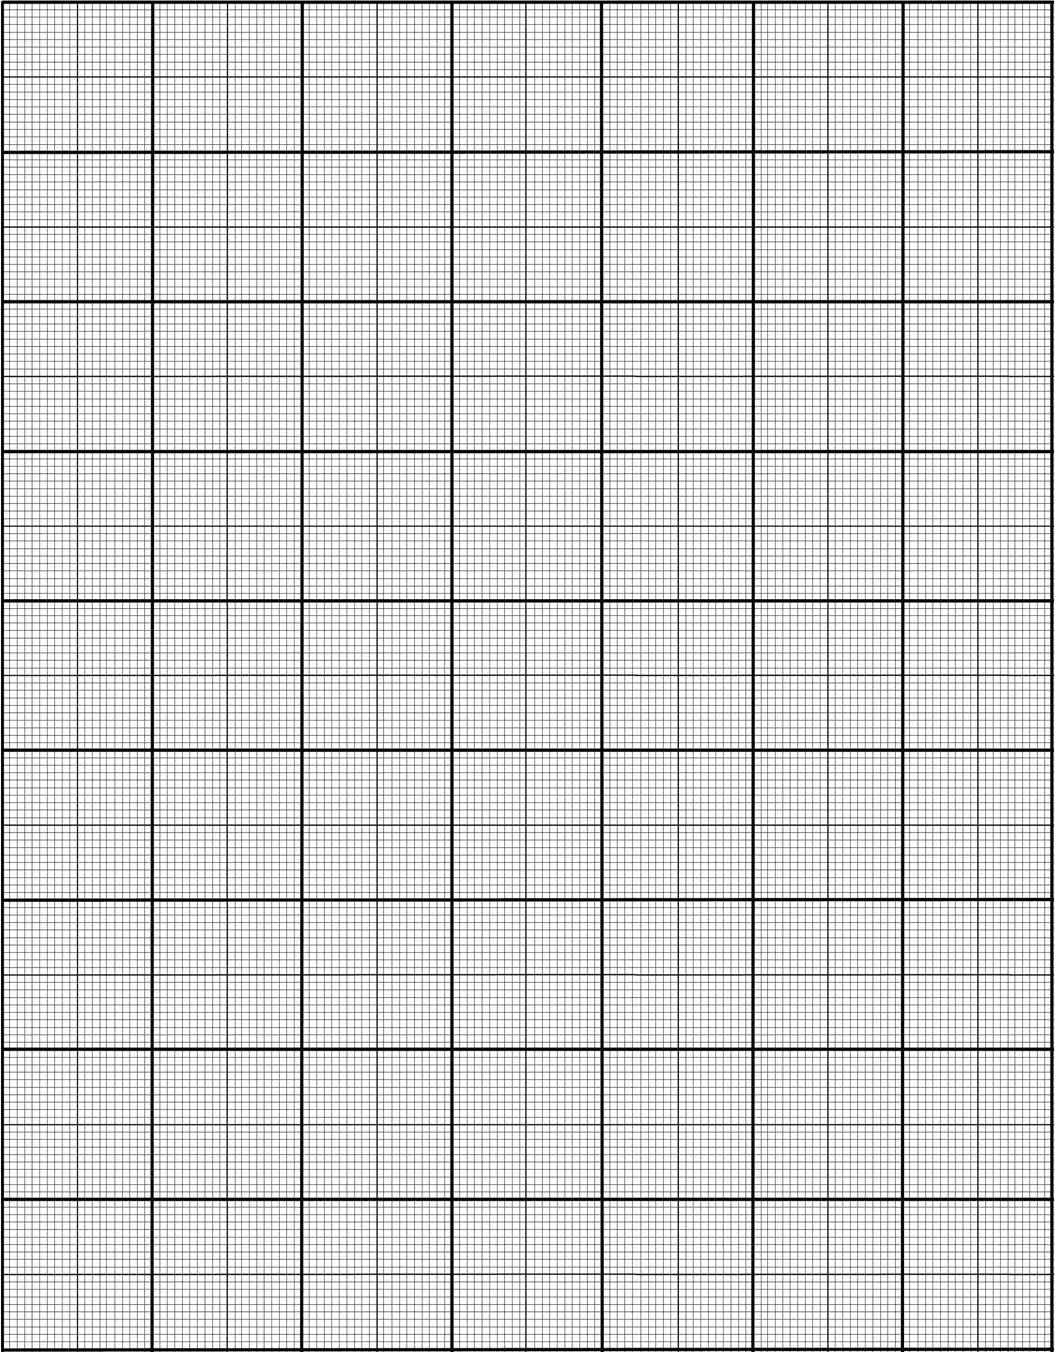 Graph Paper Template 541 | Printable Graph Paper, Graph